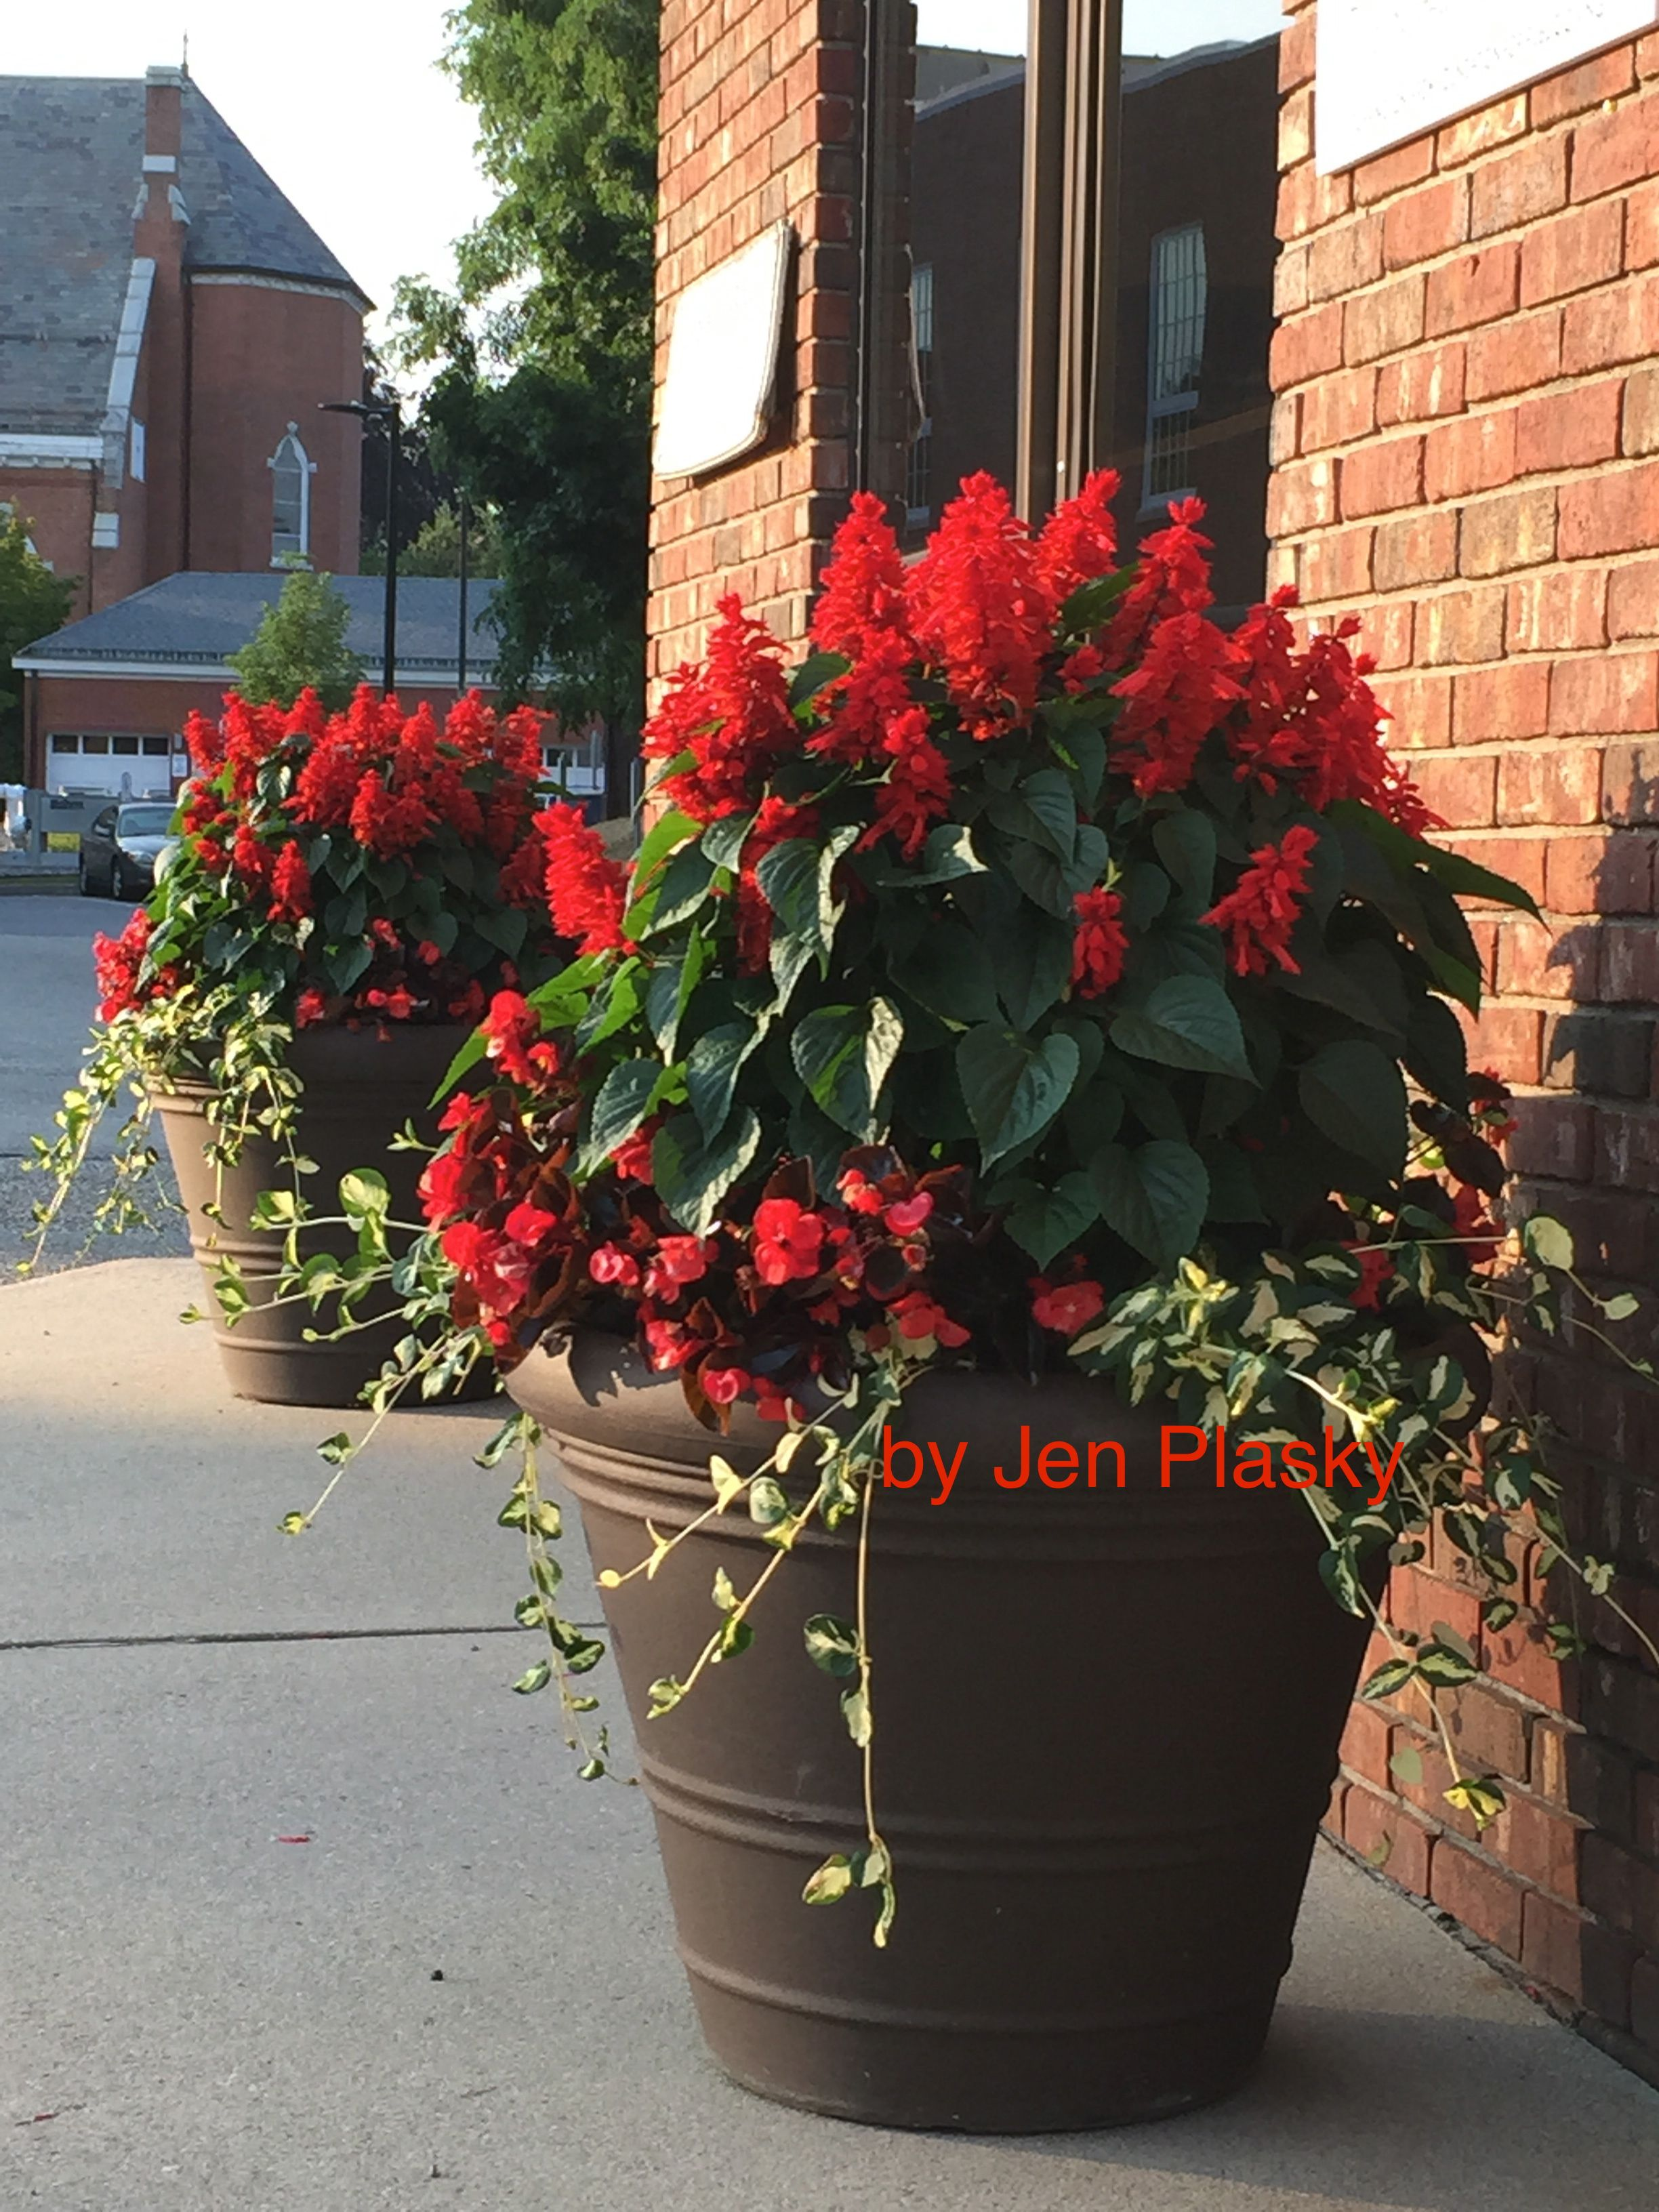 Salvia Wax Begonia Vinca Vine Potted Geraniums Country Garden Decor Container Flowers